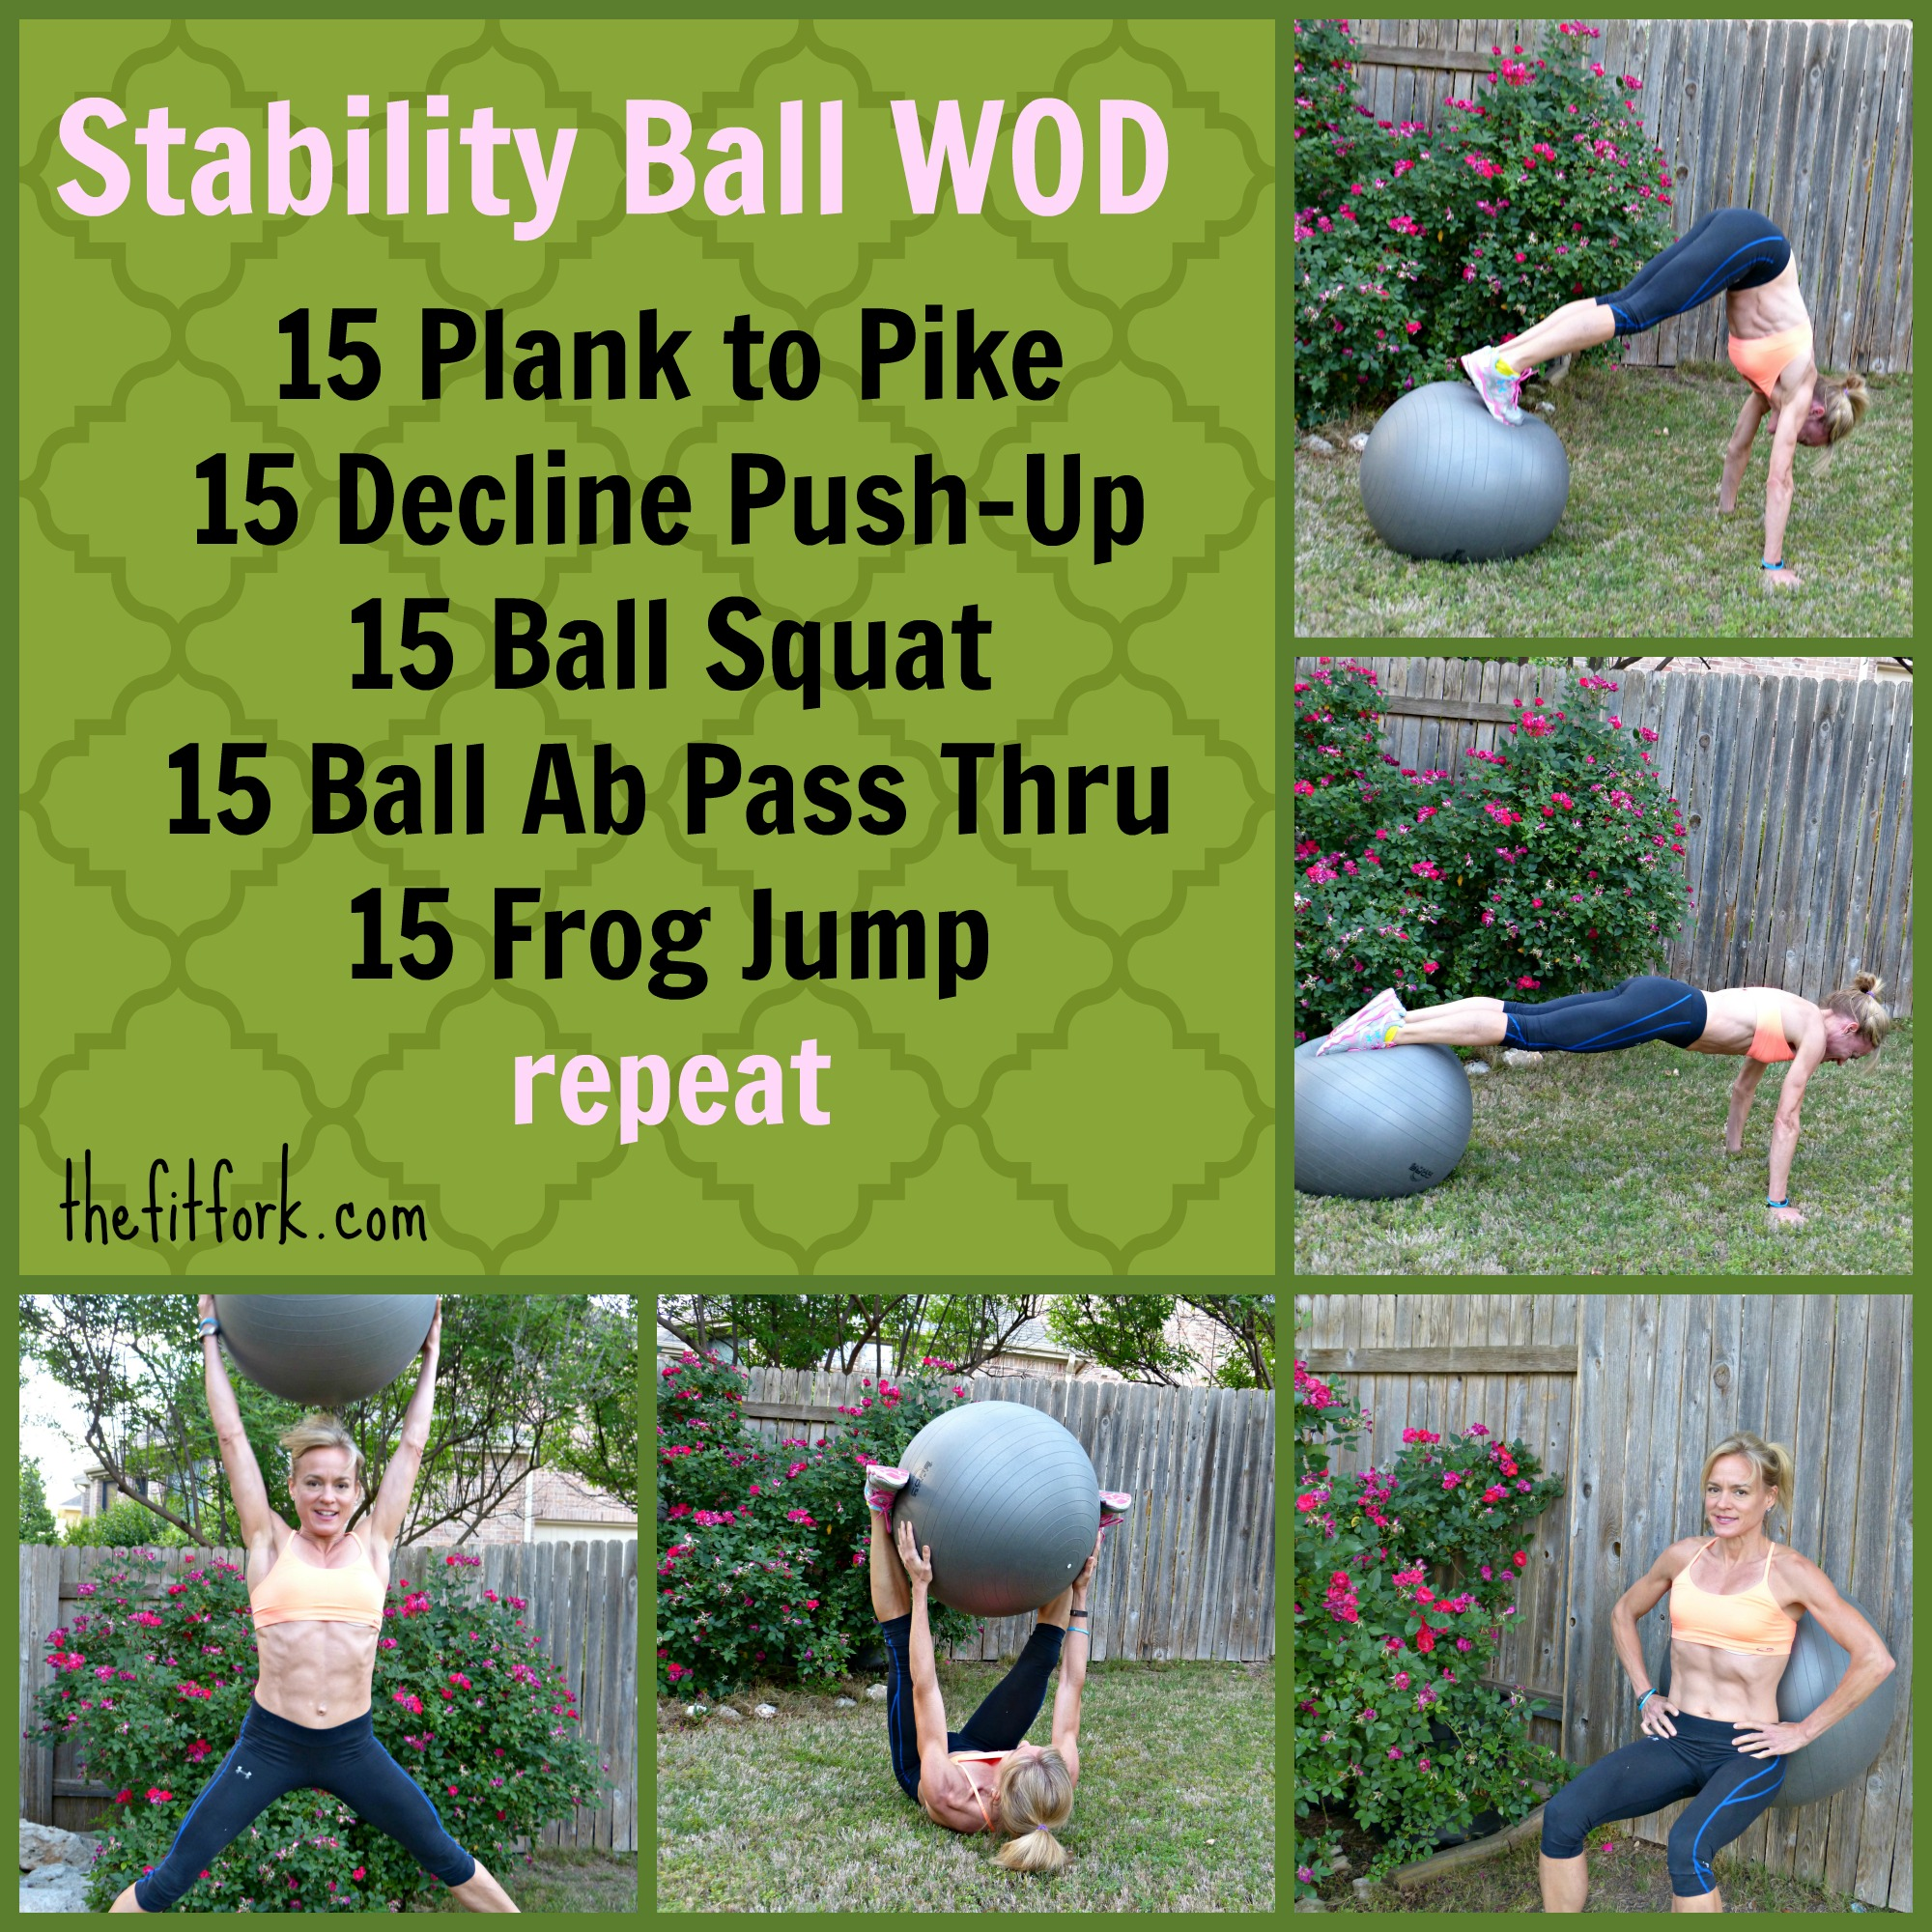 Stablity Ball Workout